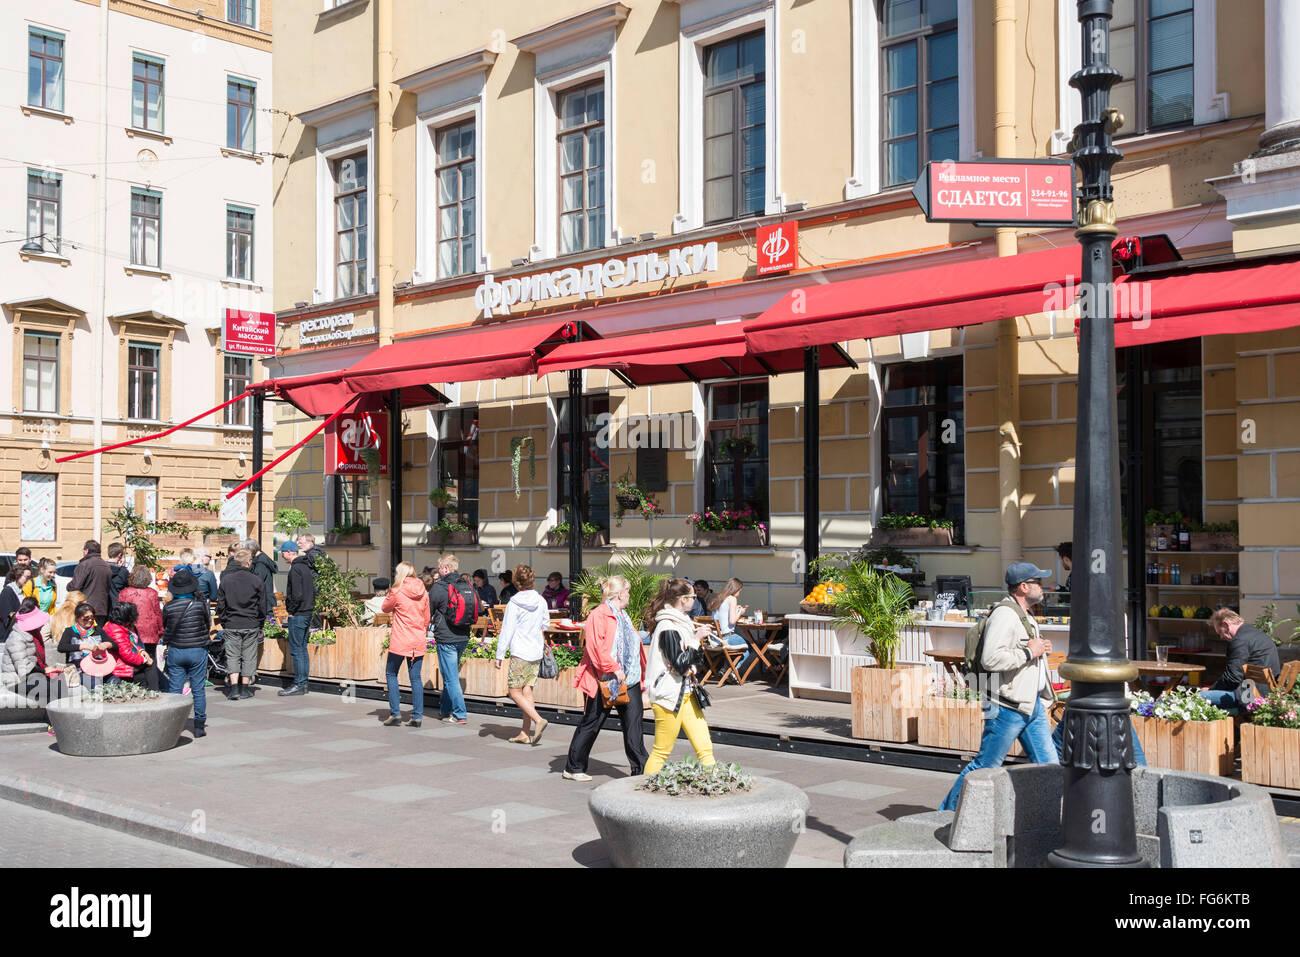 Frikadelki Restaurant & Cafe, Griboyedov Canal Embankment, Saint Petersburg, Northwestern Region, Russia - Stock Image